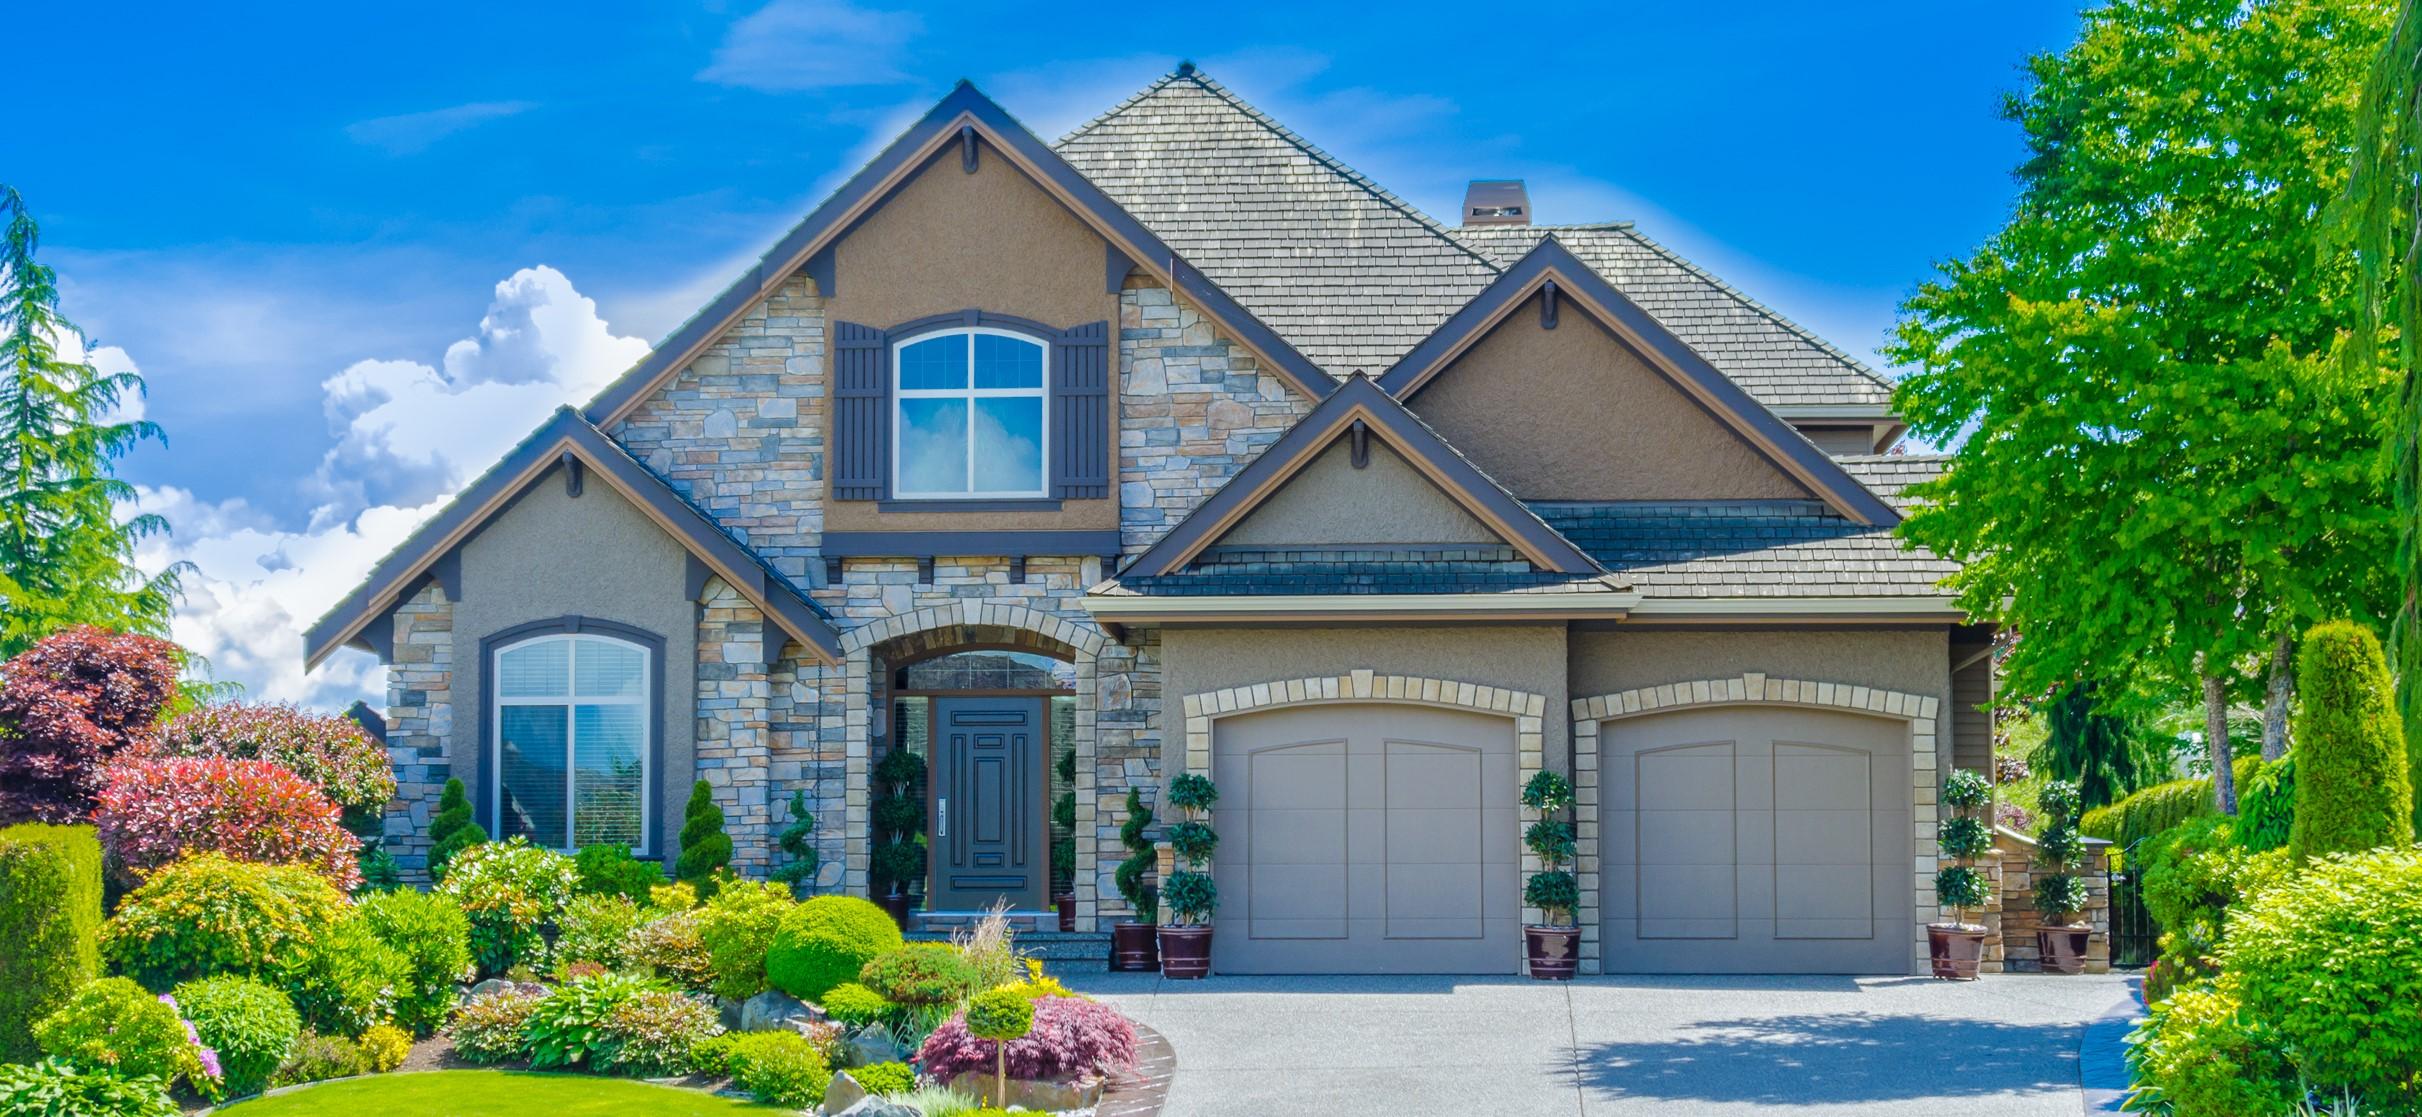 shutterstock_house